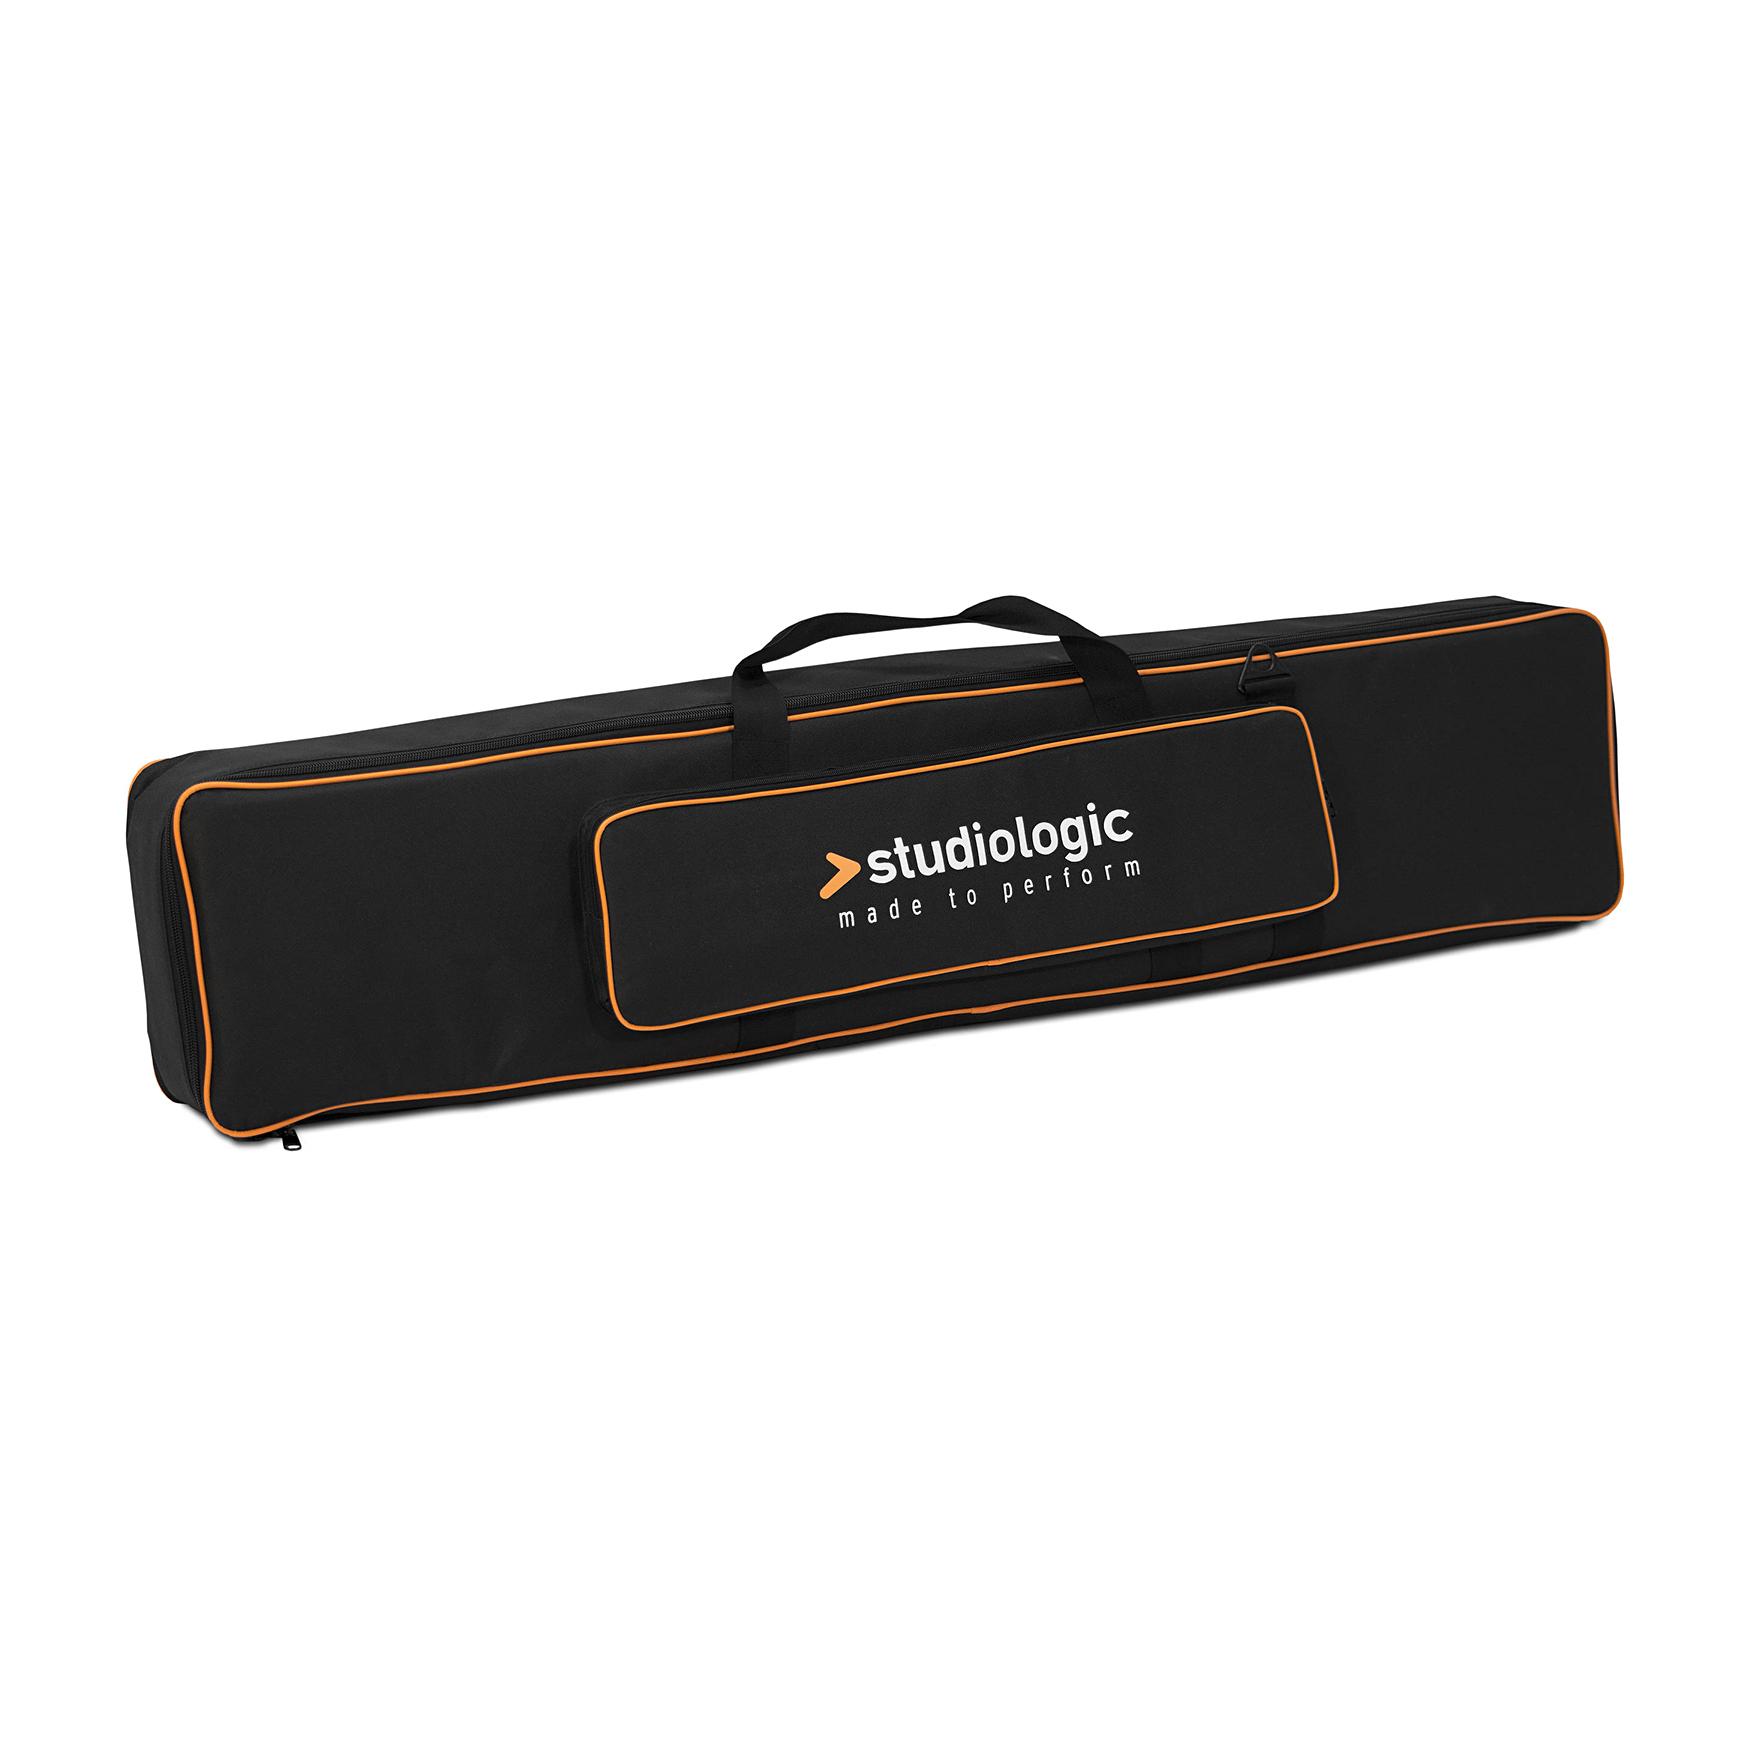 Studiologic Numa Compact Soft Case